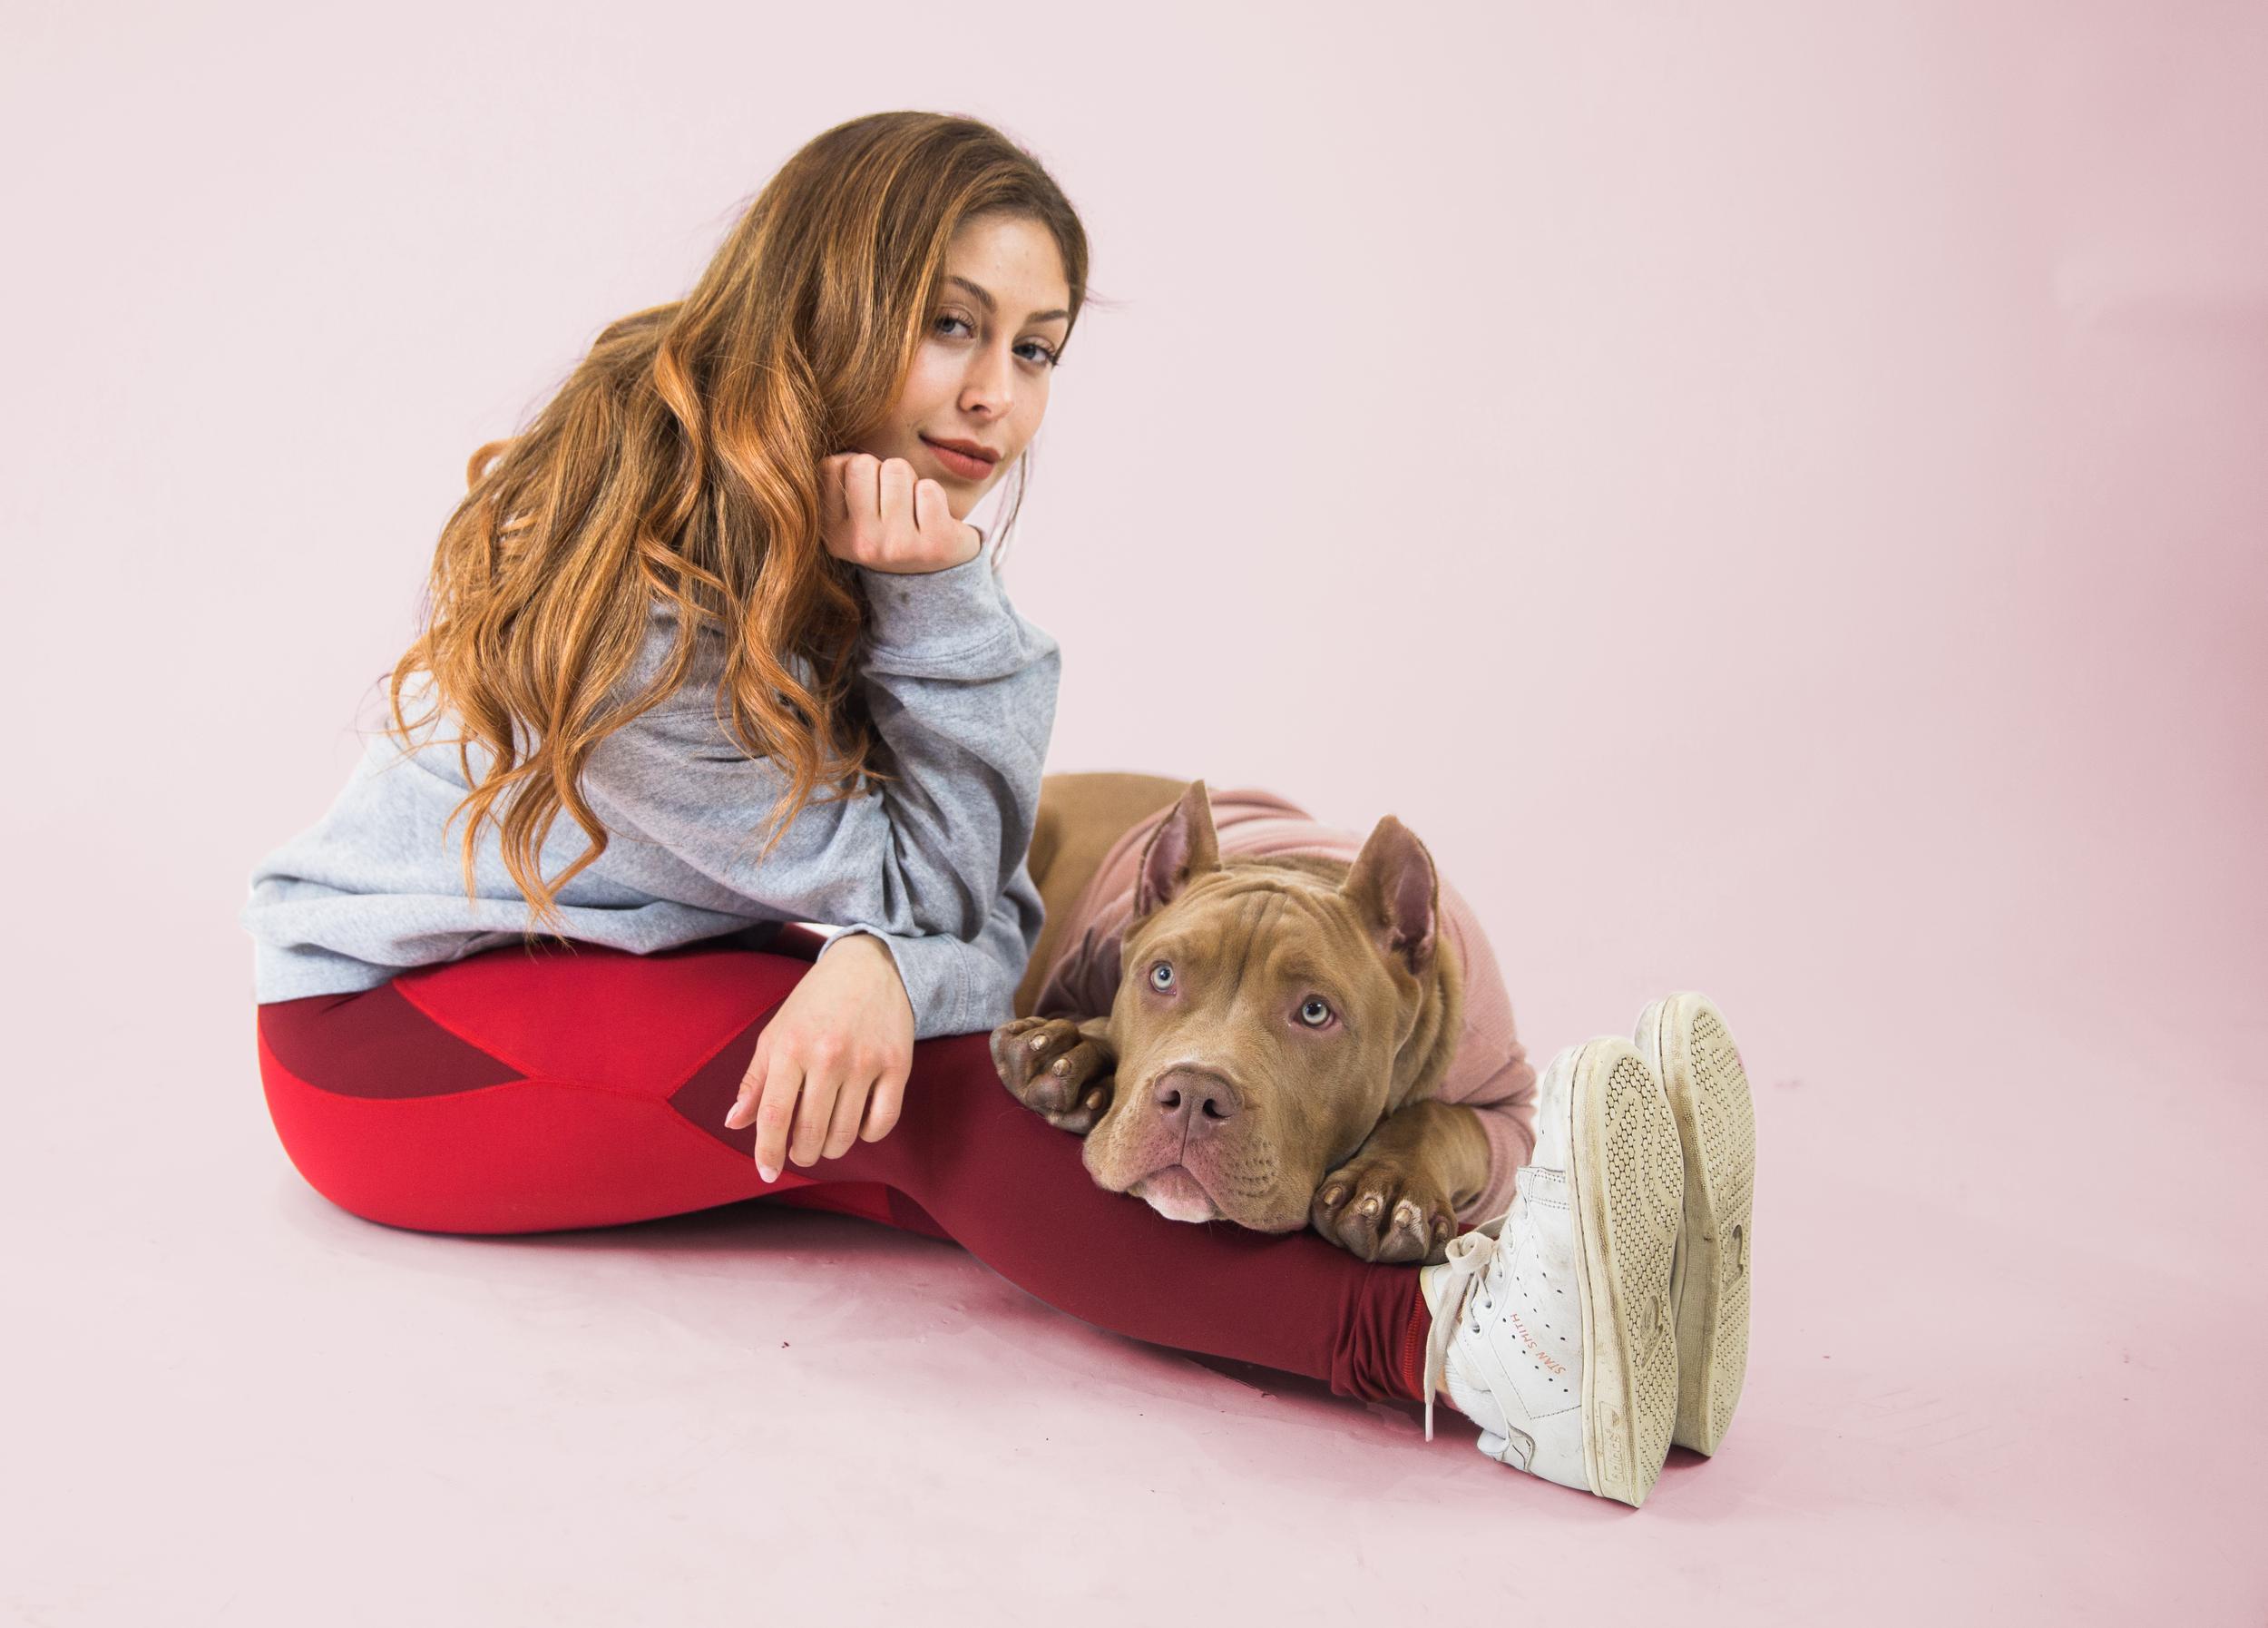 Meet Koa. - Age: 7 monthsBreed: XL American BulldogHometown: Toronto, Ontario